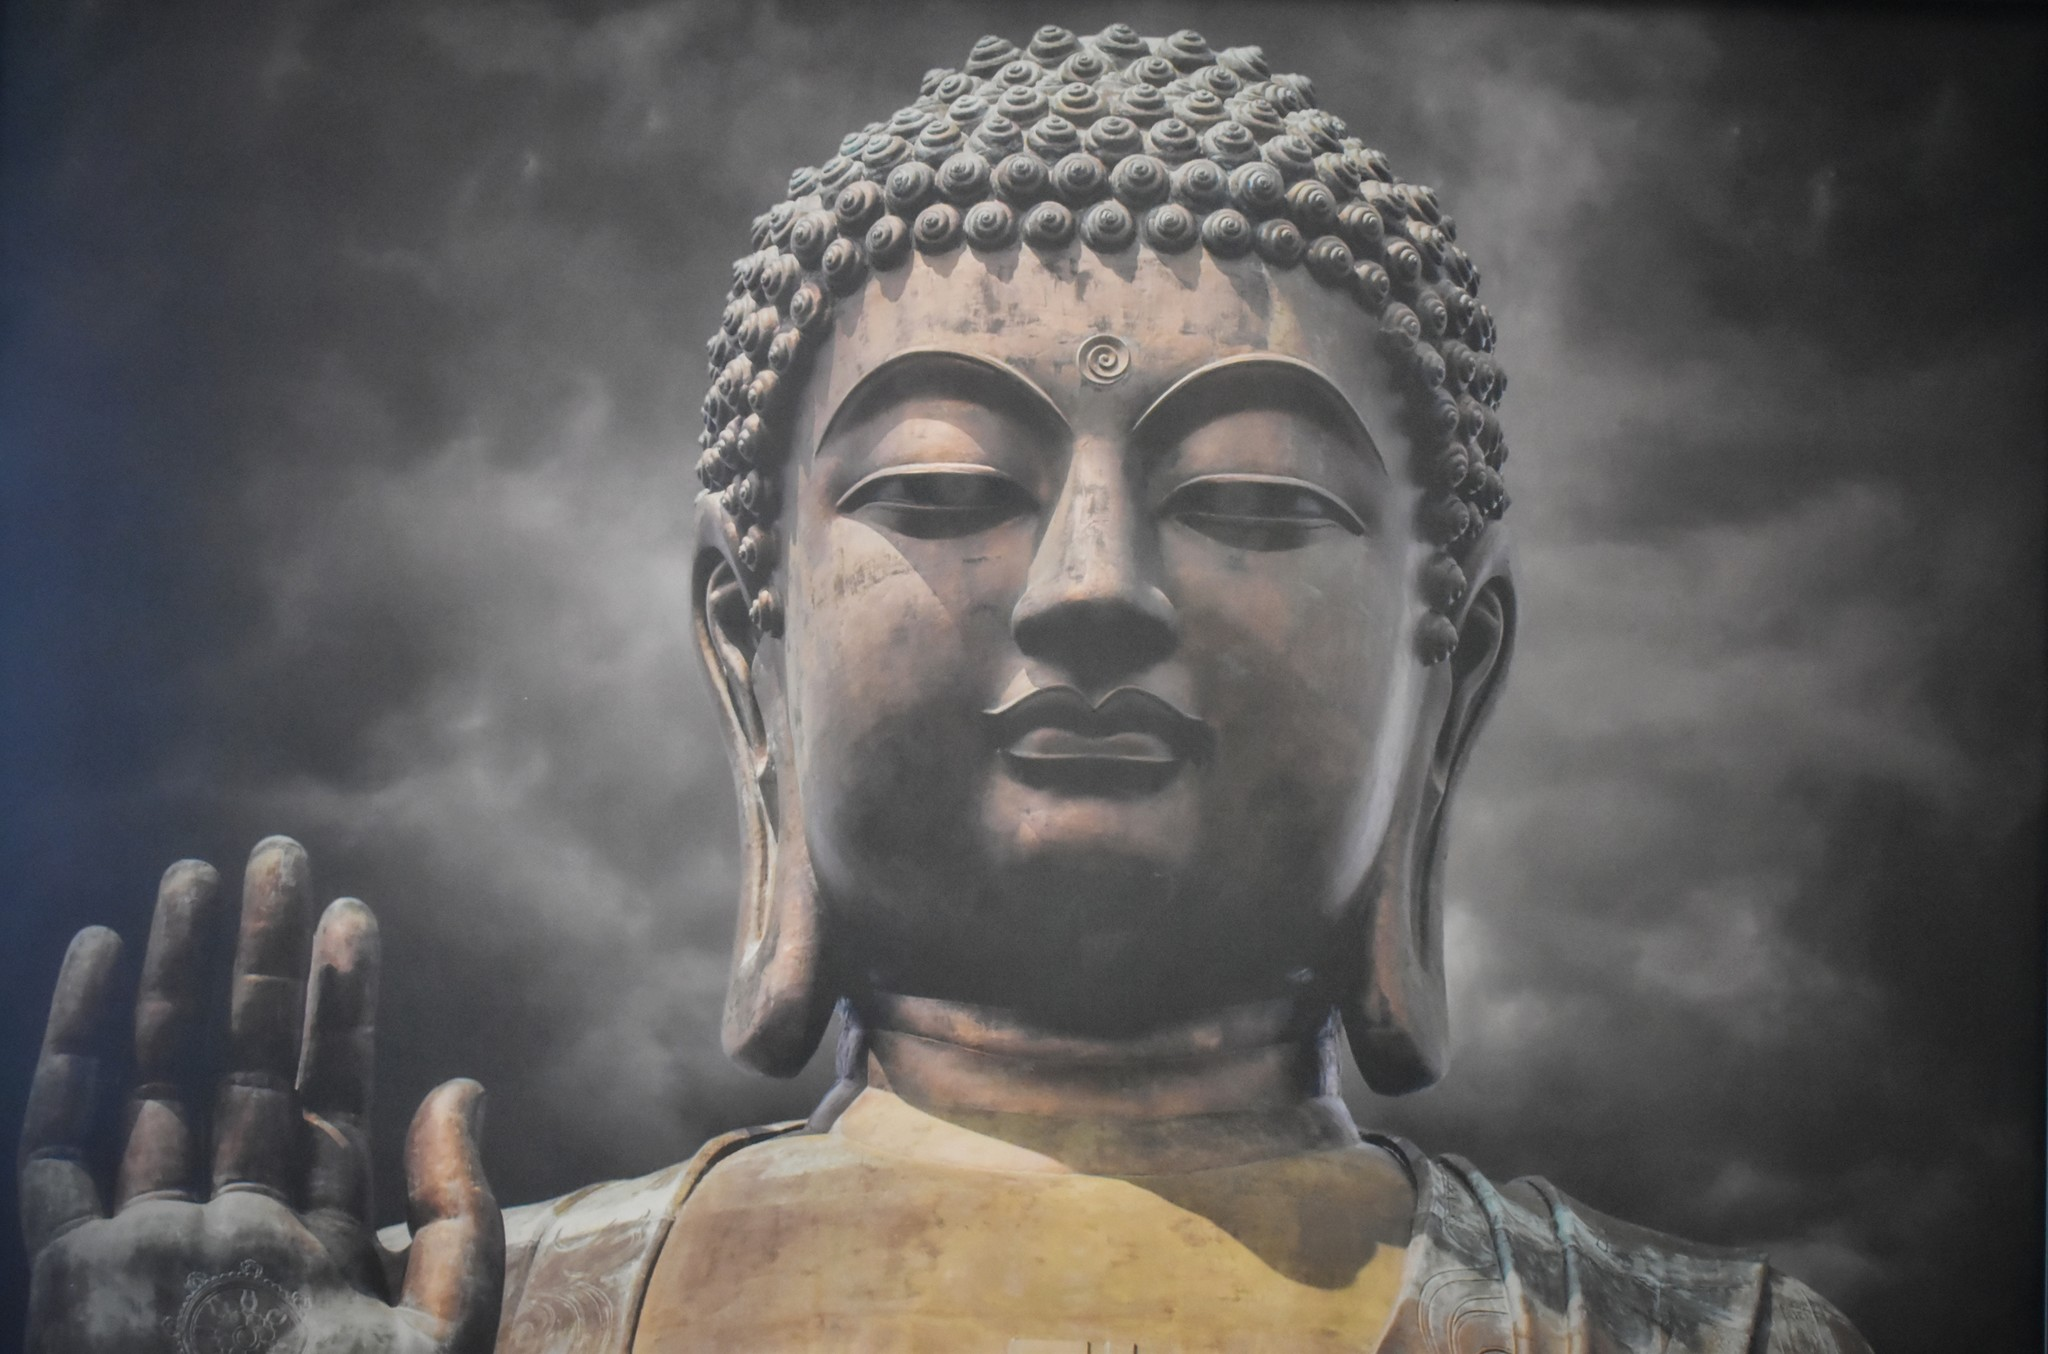 Schilderij -Boeddha, de Verlichting, 100x70cm. premium print -  1 luik